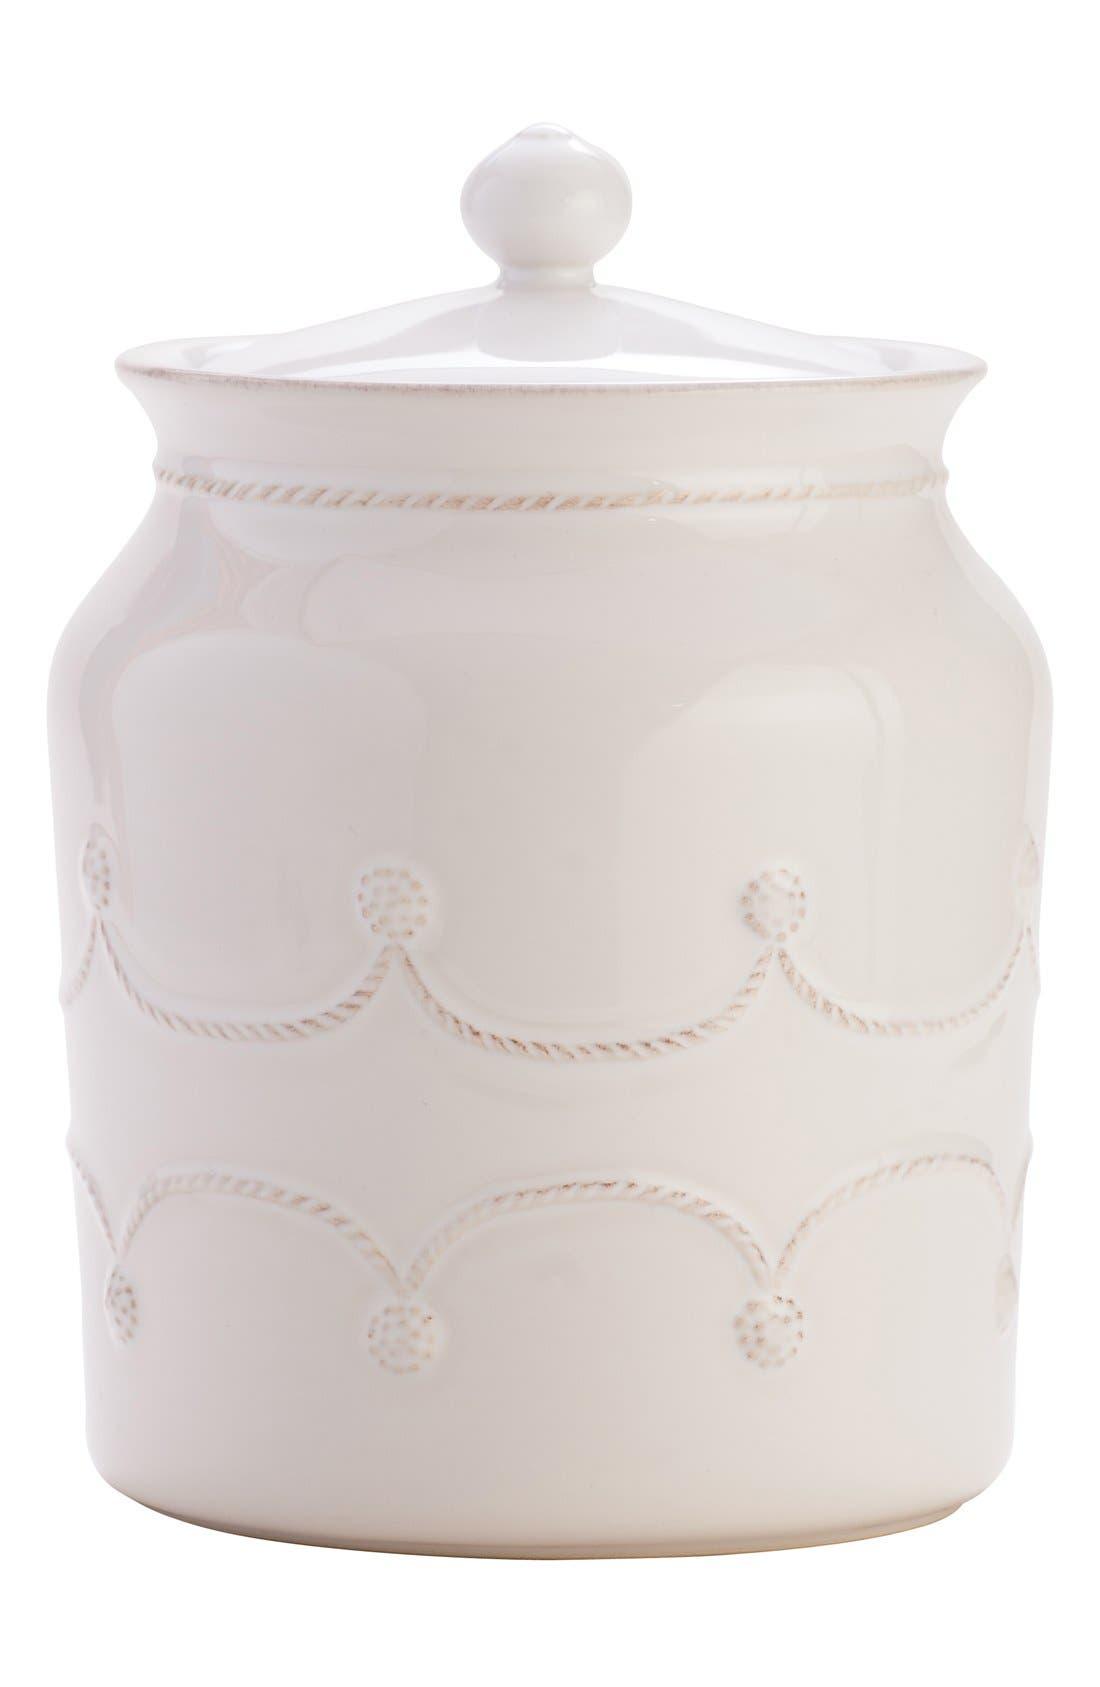 Alternate Image 1 Selected - Juliska'Berry and Thread' Ceramic Cookie Jar